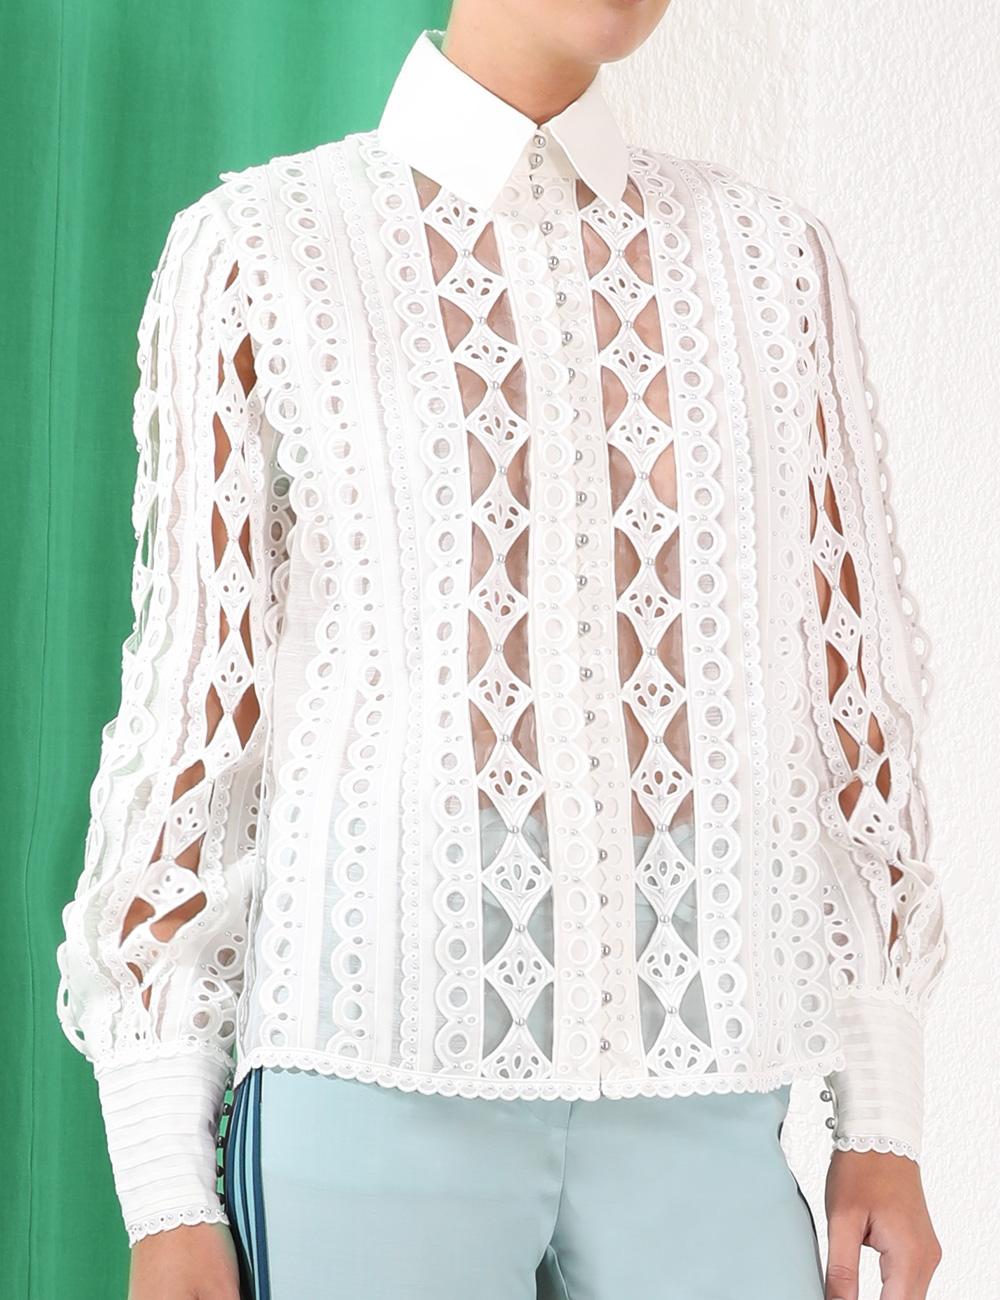 Moncur Studded Shirt